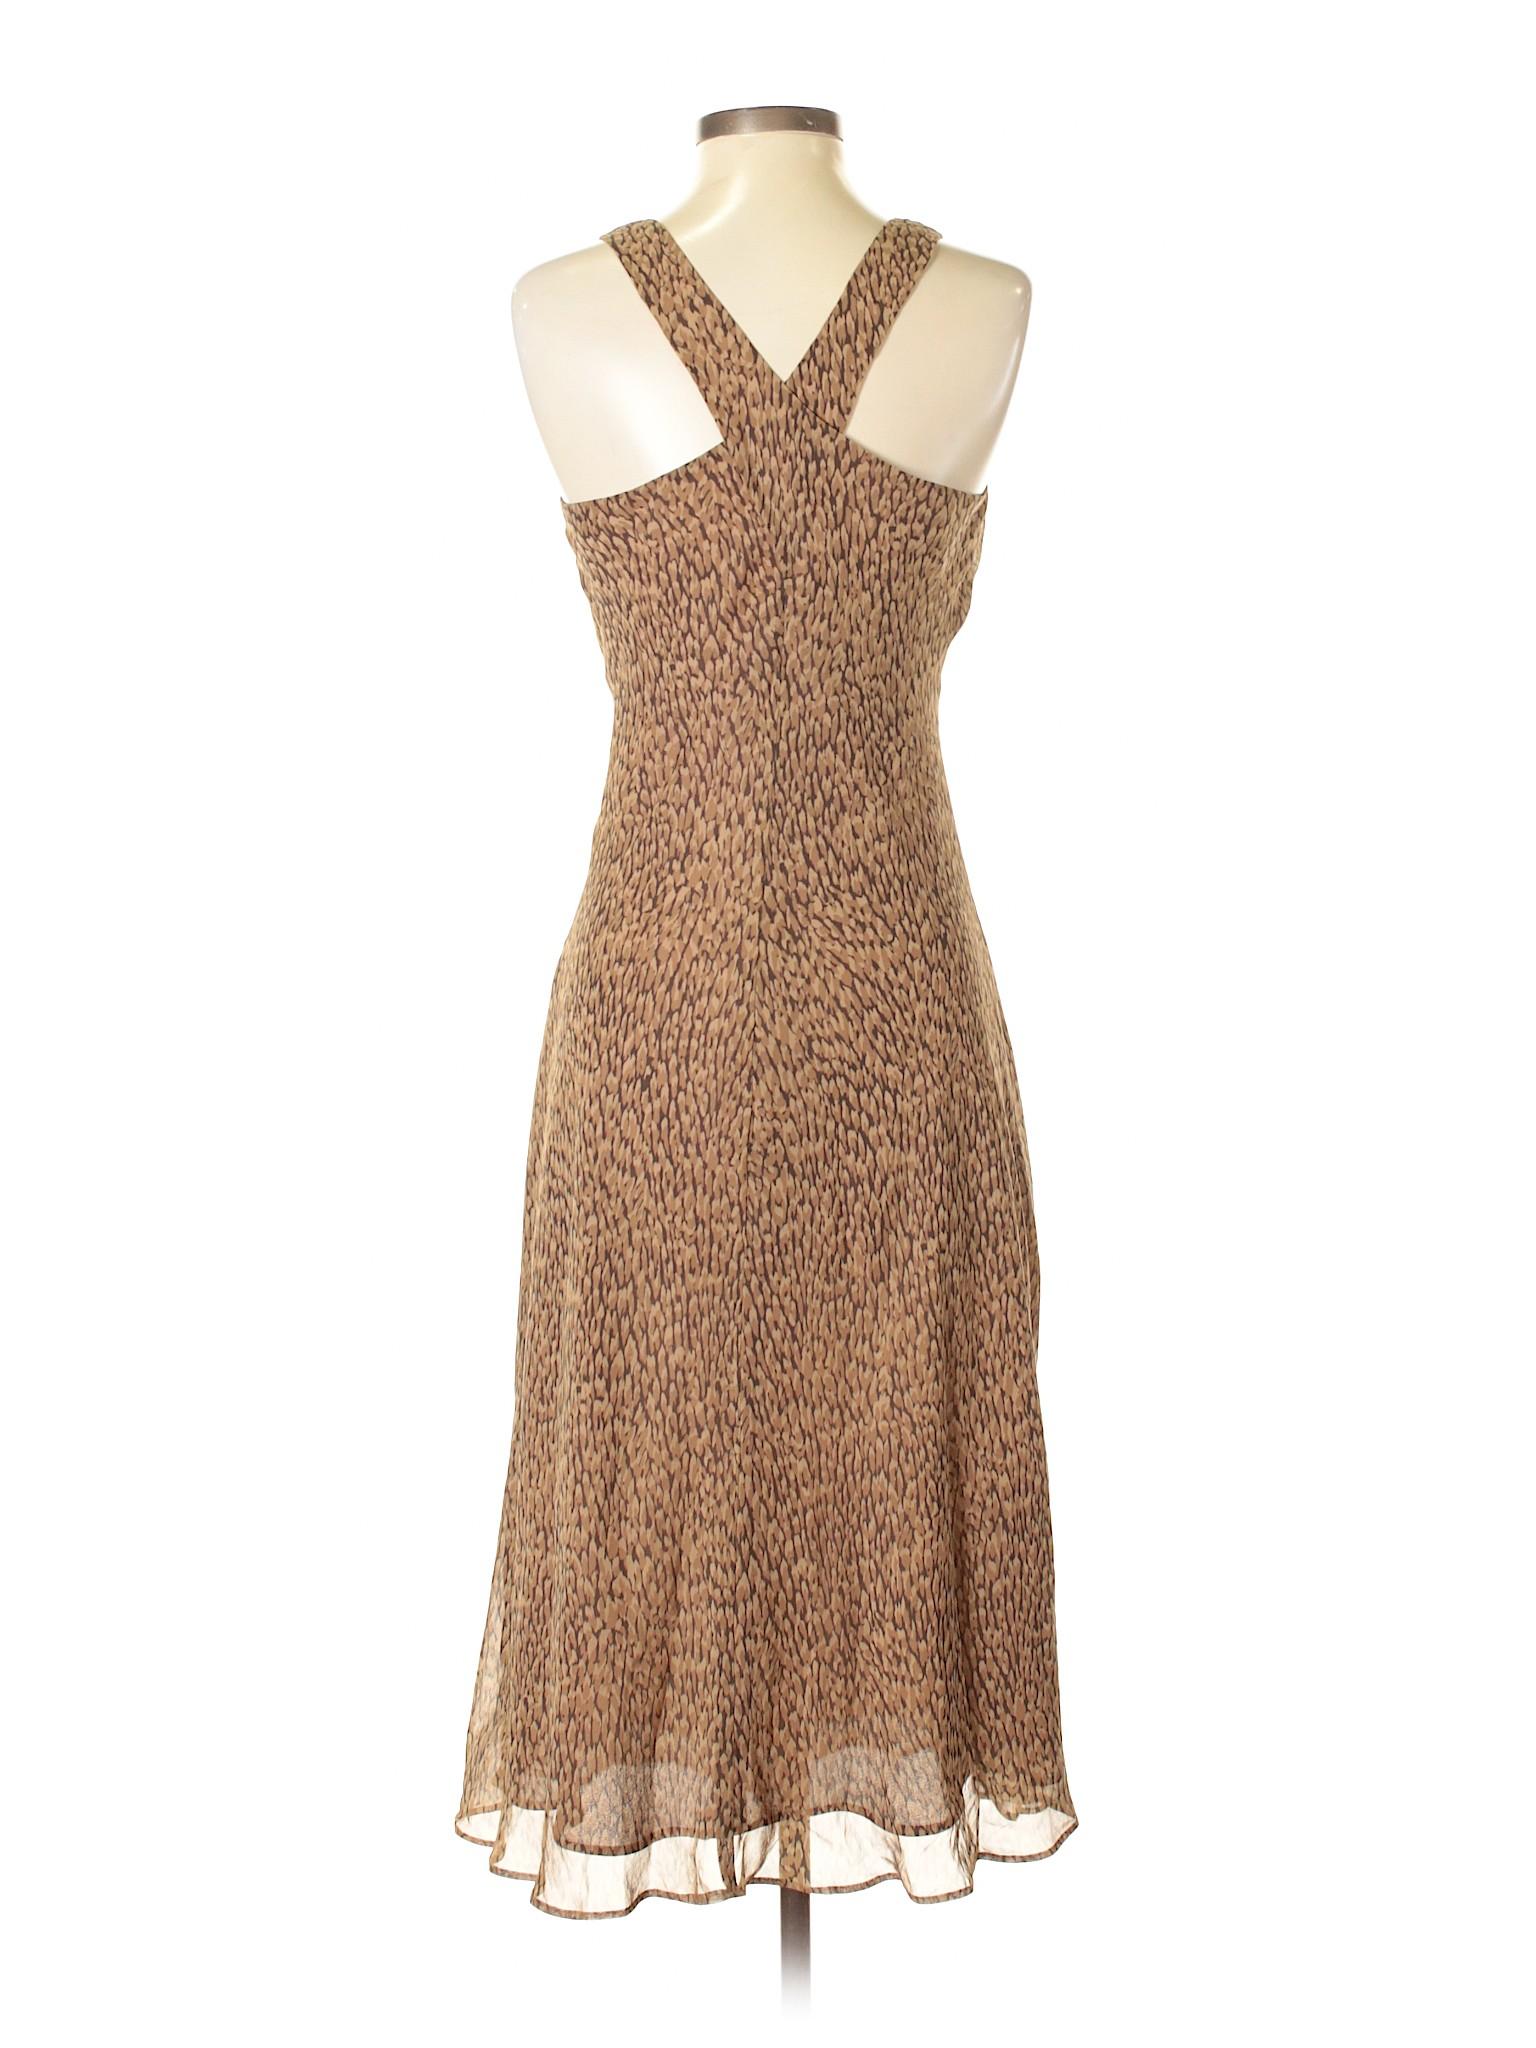 Ann Casual Casual Dress Taylor Ann Selling Dress Taylor Selling ztOwx65Oq